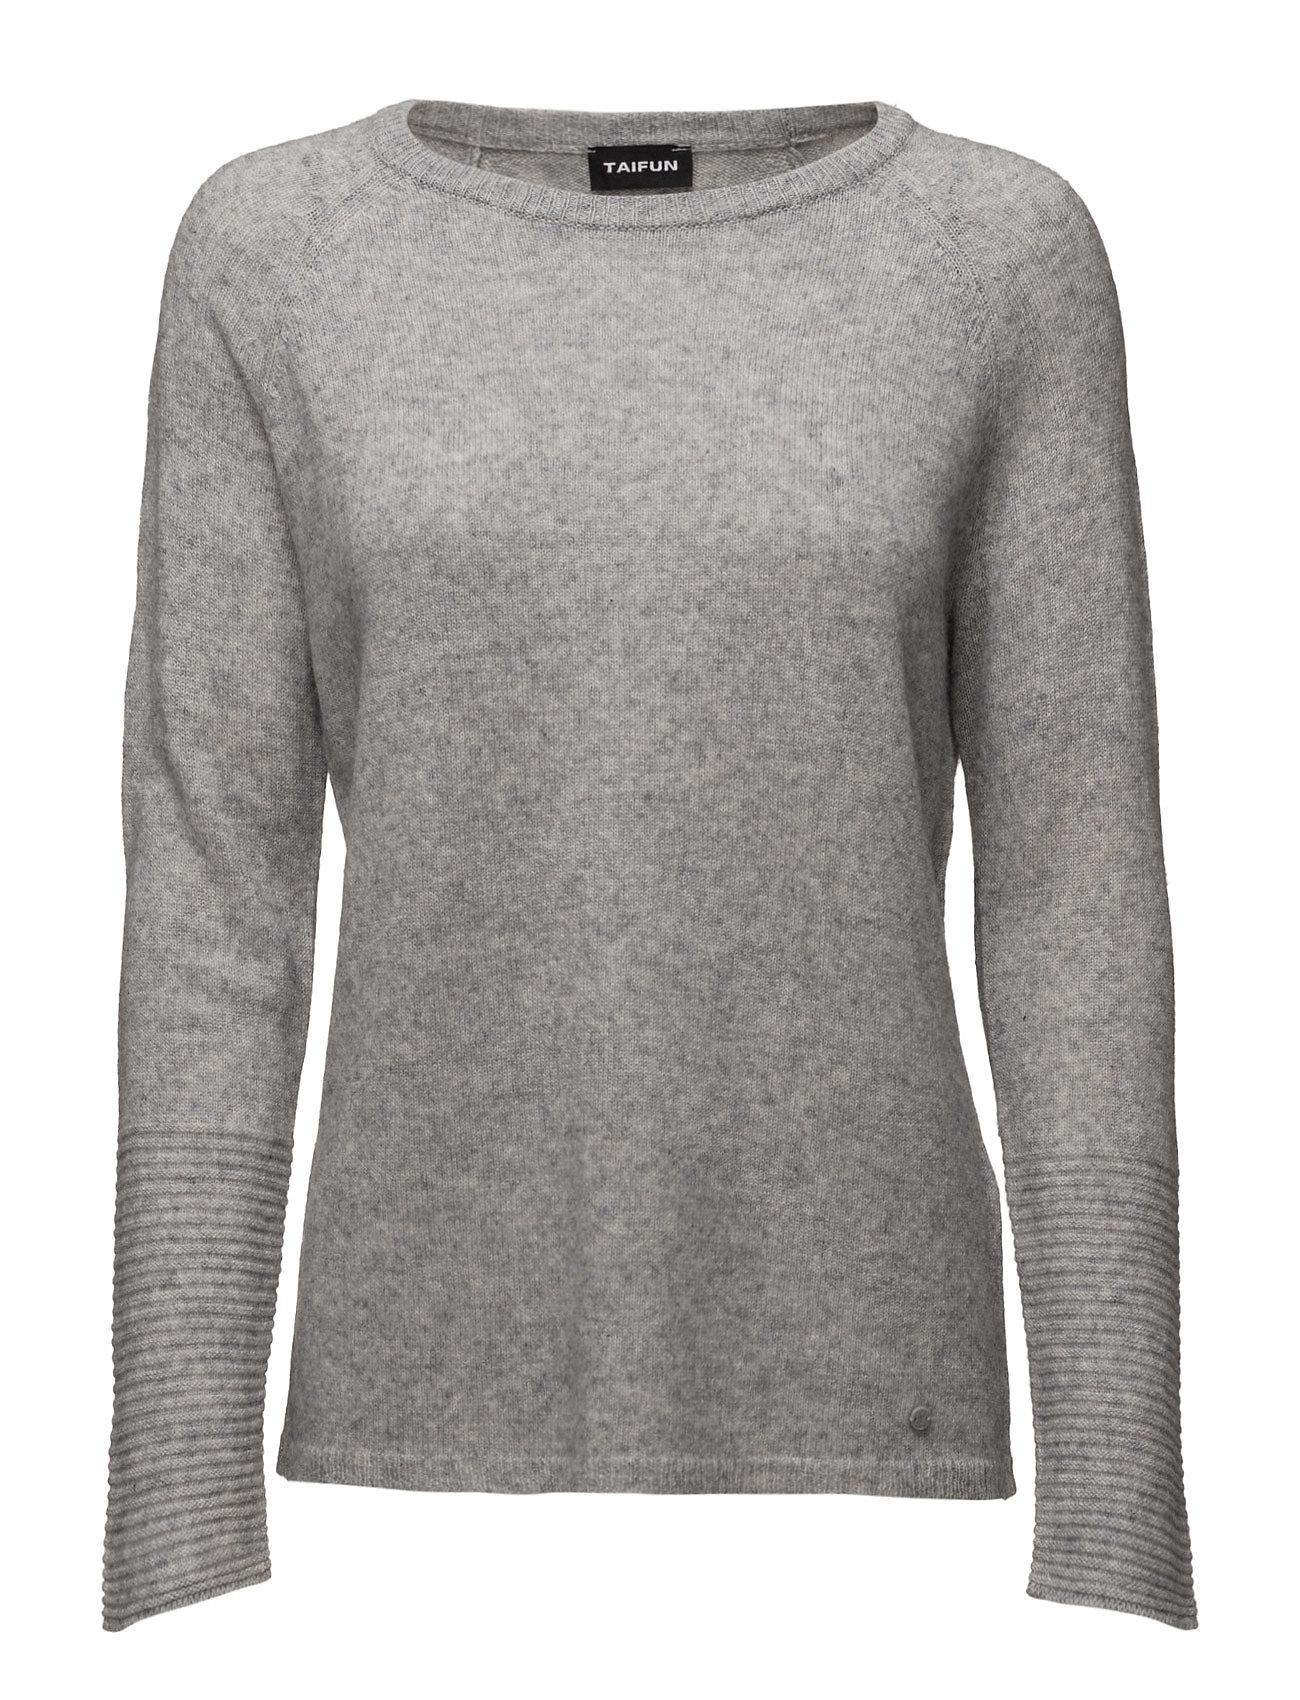 Pullover Long-Sleeve Taifun Sweatshirts til Damer i